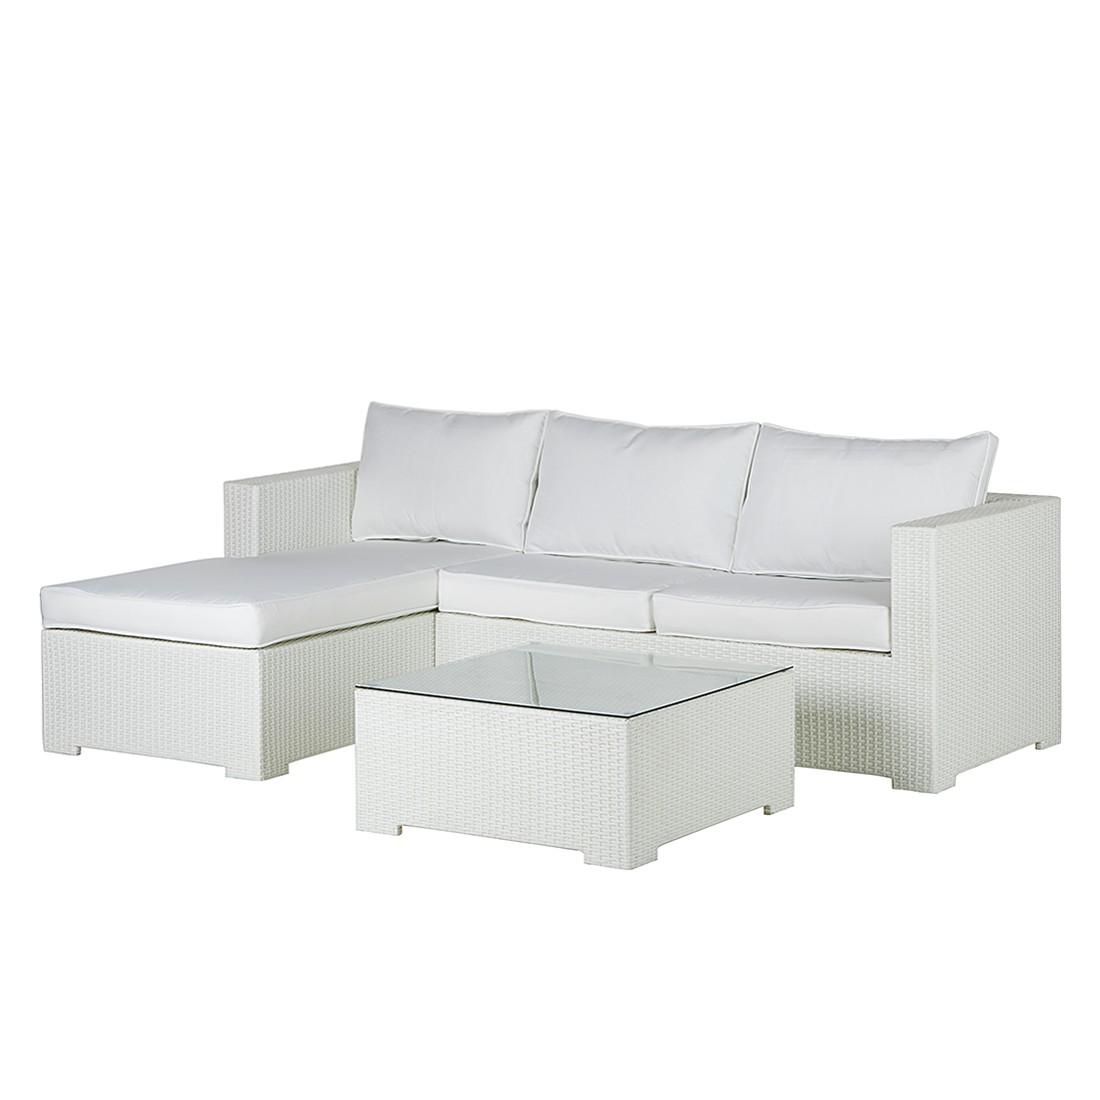 Lounge Sitzgruppe Paradise Lounge (3-teilig) - Polyrattan / Textil - Weiß, Fredriks